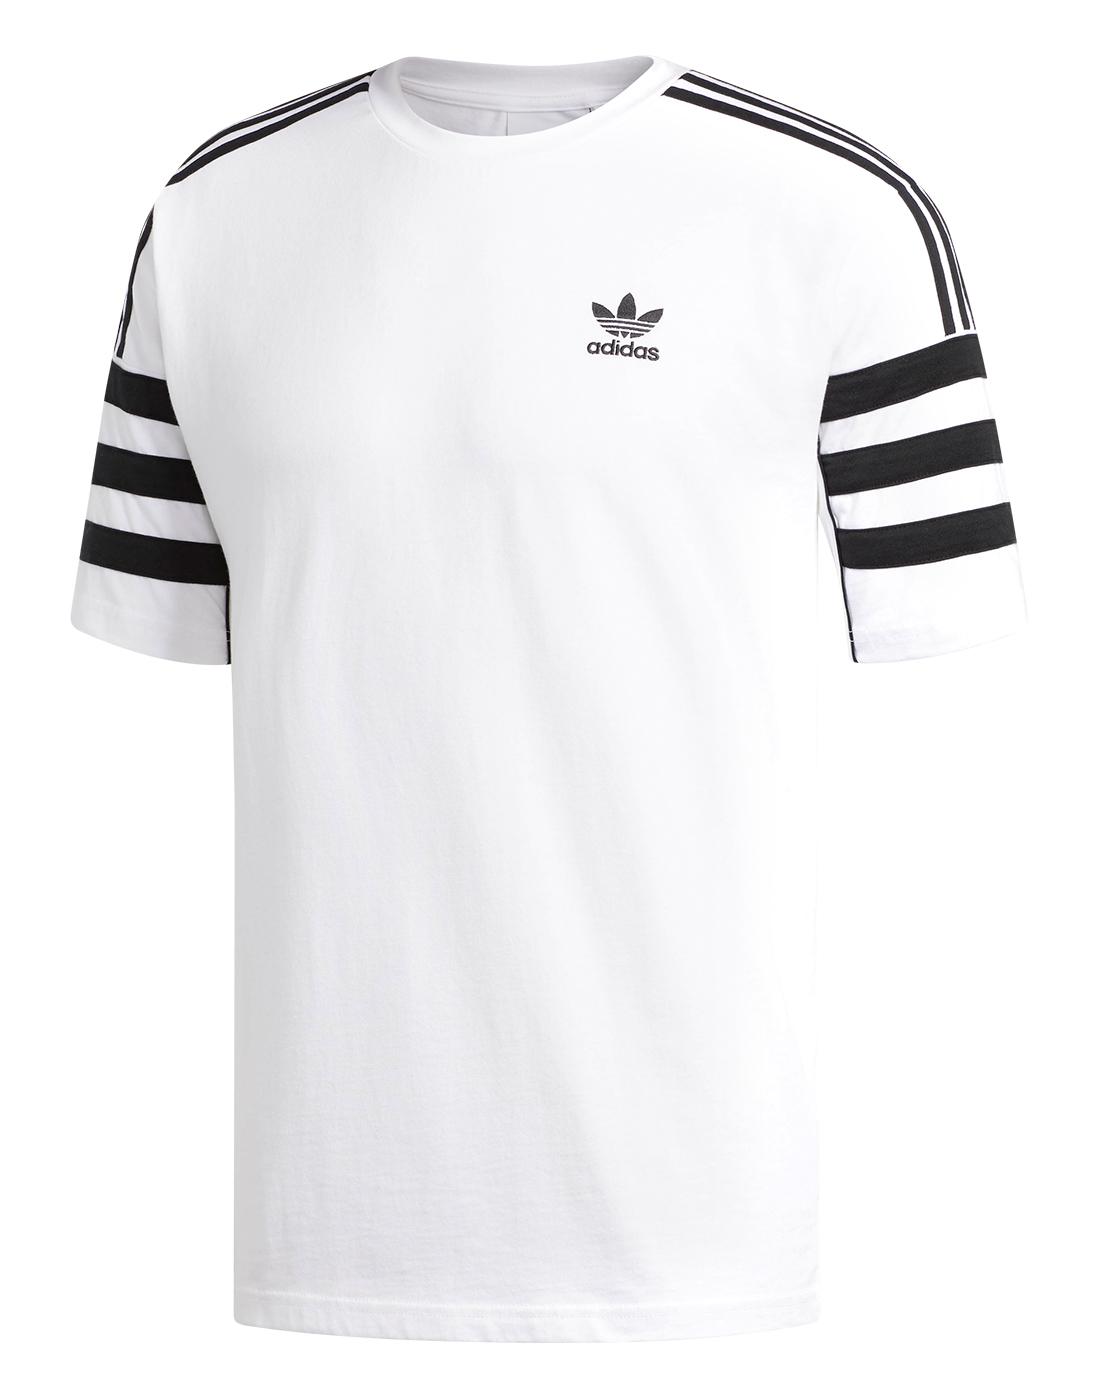 8d535705f adidas Originals Mens Authentic T-Shirt | Life Style Sports